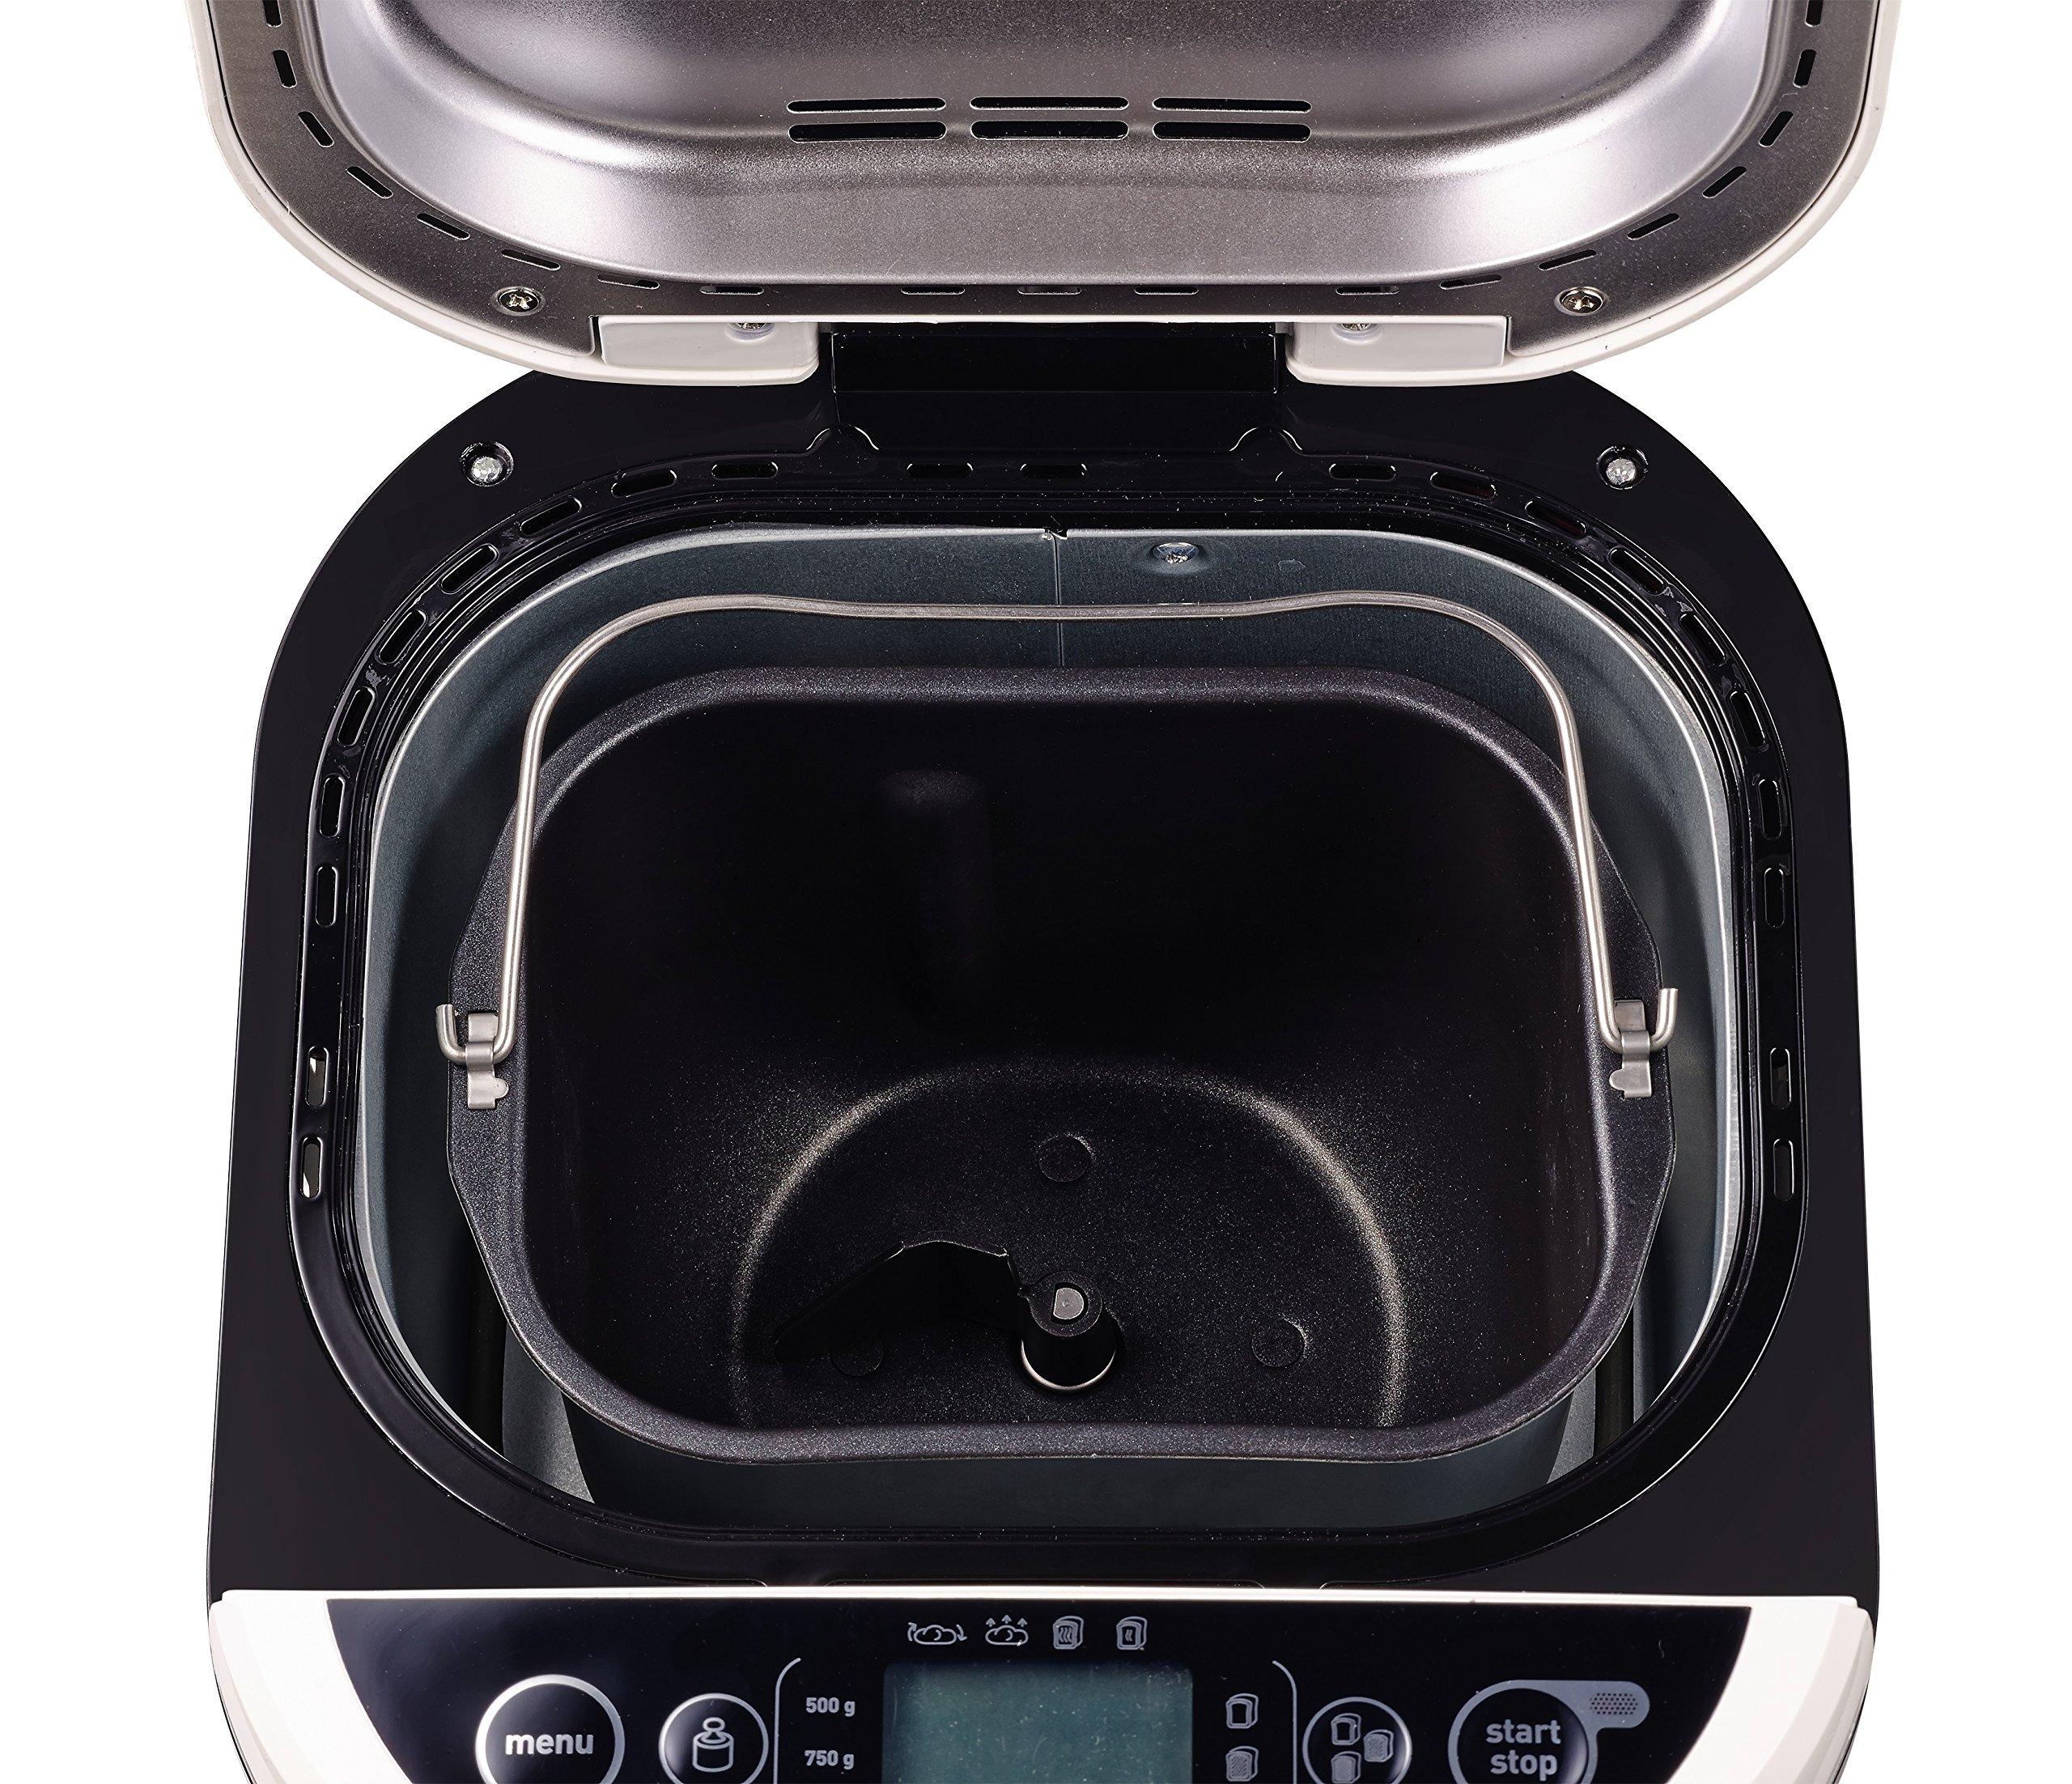 Moulinex OW210130 Pain Doré Macchina per il Pane, Capacità 1 kg, 12 Programmi Automatici 3 spesavip